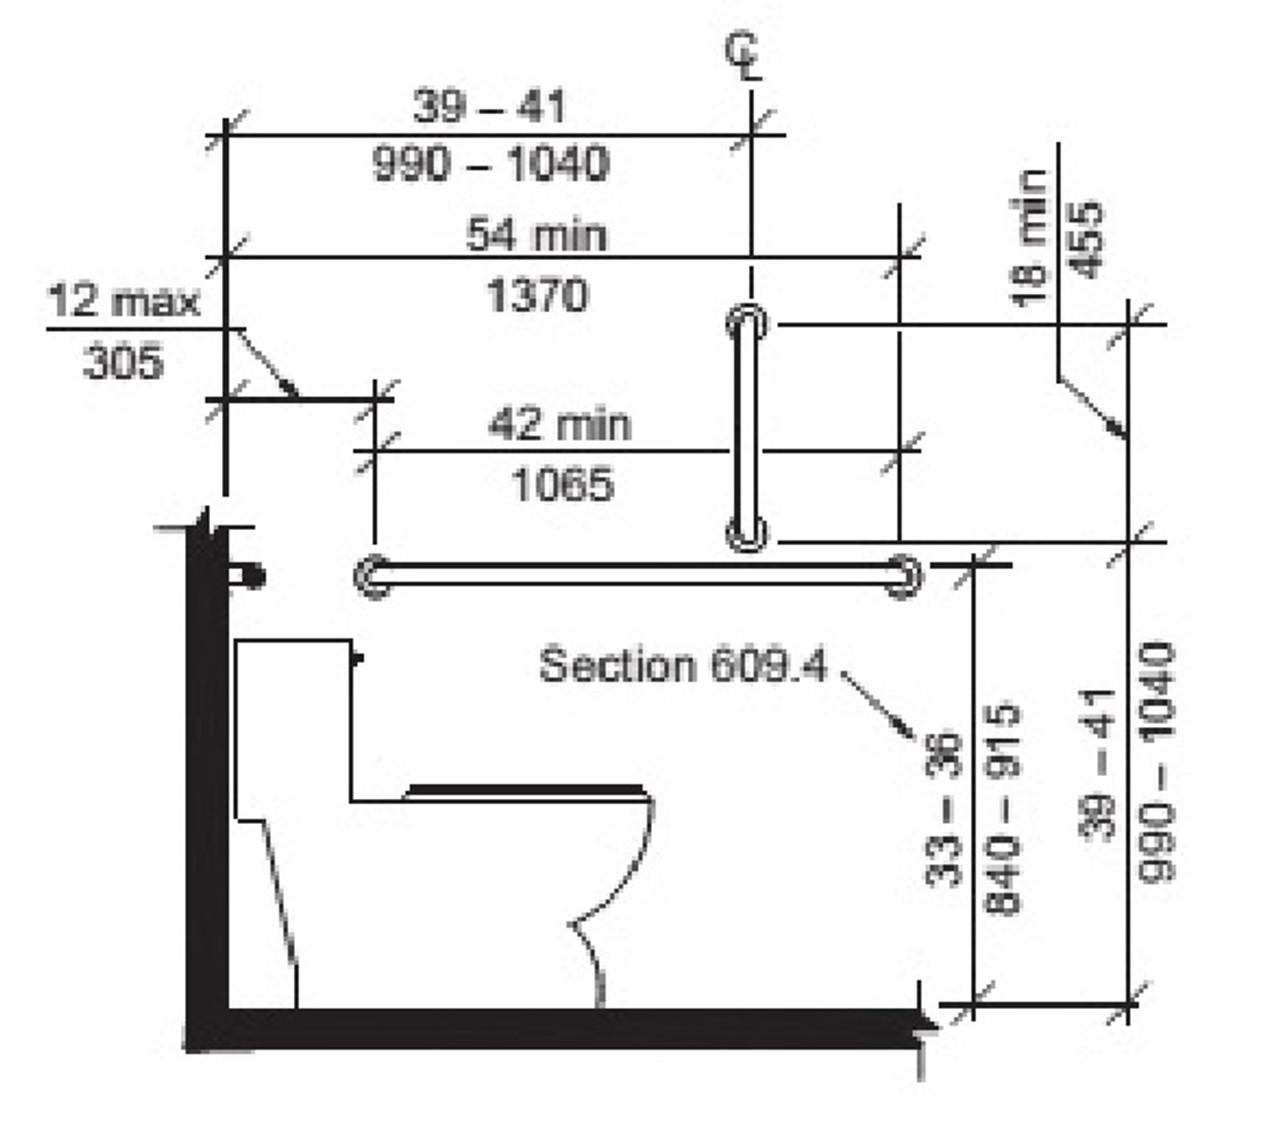 Industrial Pipe Handrail Grab Bar - ADA Restroom Compliant